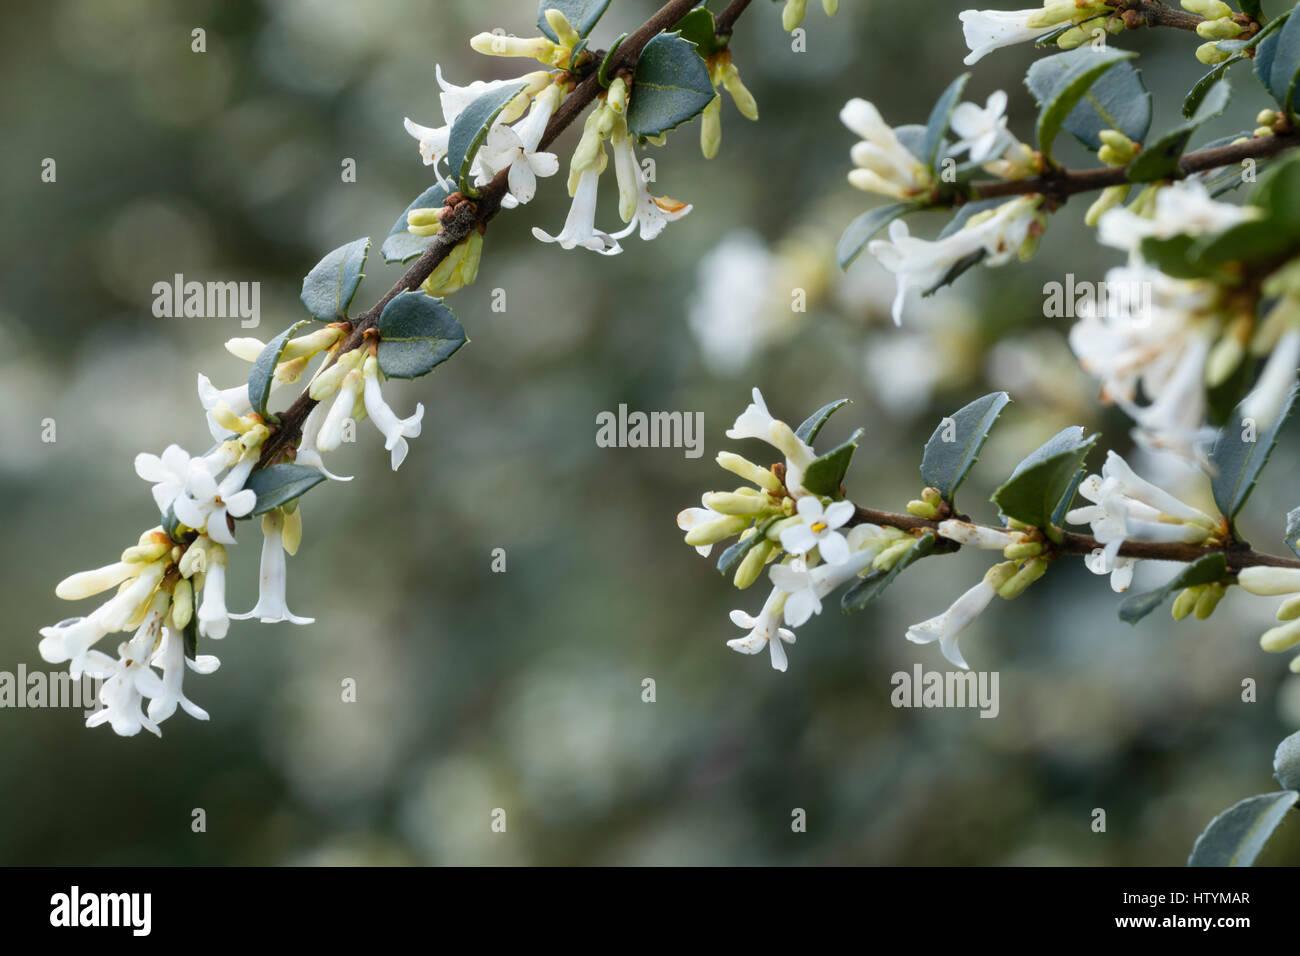 Fragrant white spring flowers adorn the drooping branches of the fragrant white spring flowers adorn the drooping branches of the evergreen shrub osmanthus delavayi mightylinksfo